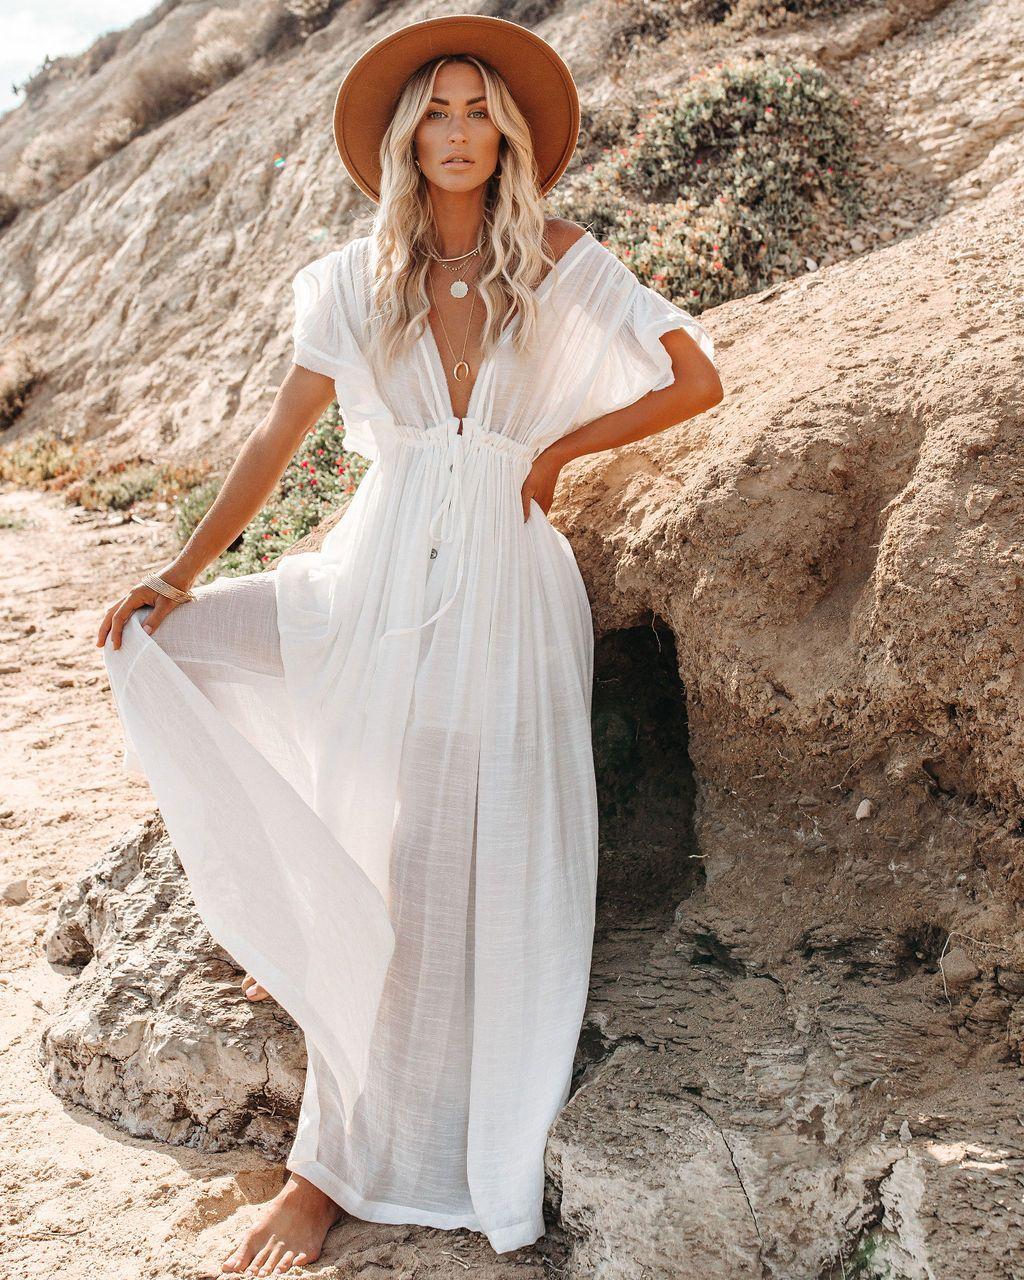 Anika Pocketed Button Down Ruffle Maxi Dress Marshmallow White Boho Dress Summer Dresses For Women Boho Maxi Dress [ 1280 x 1024 Pixel ]